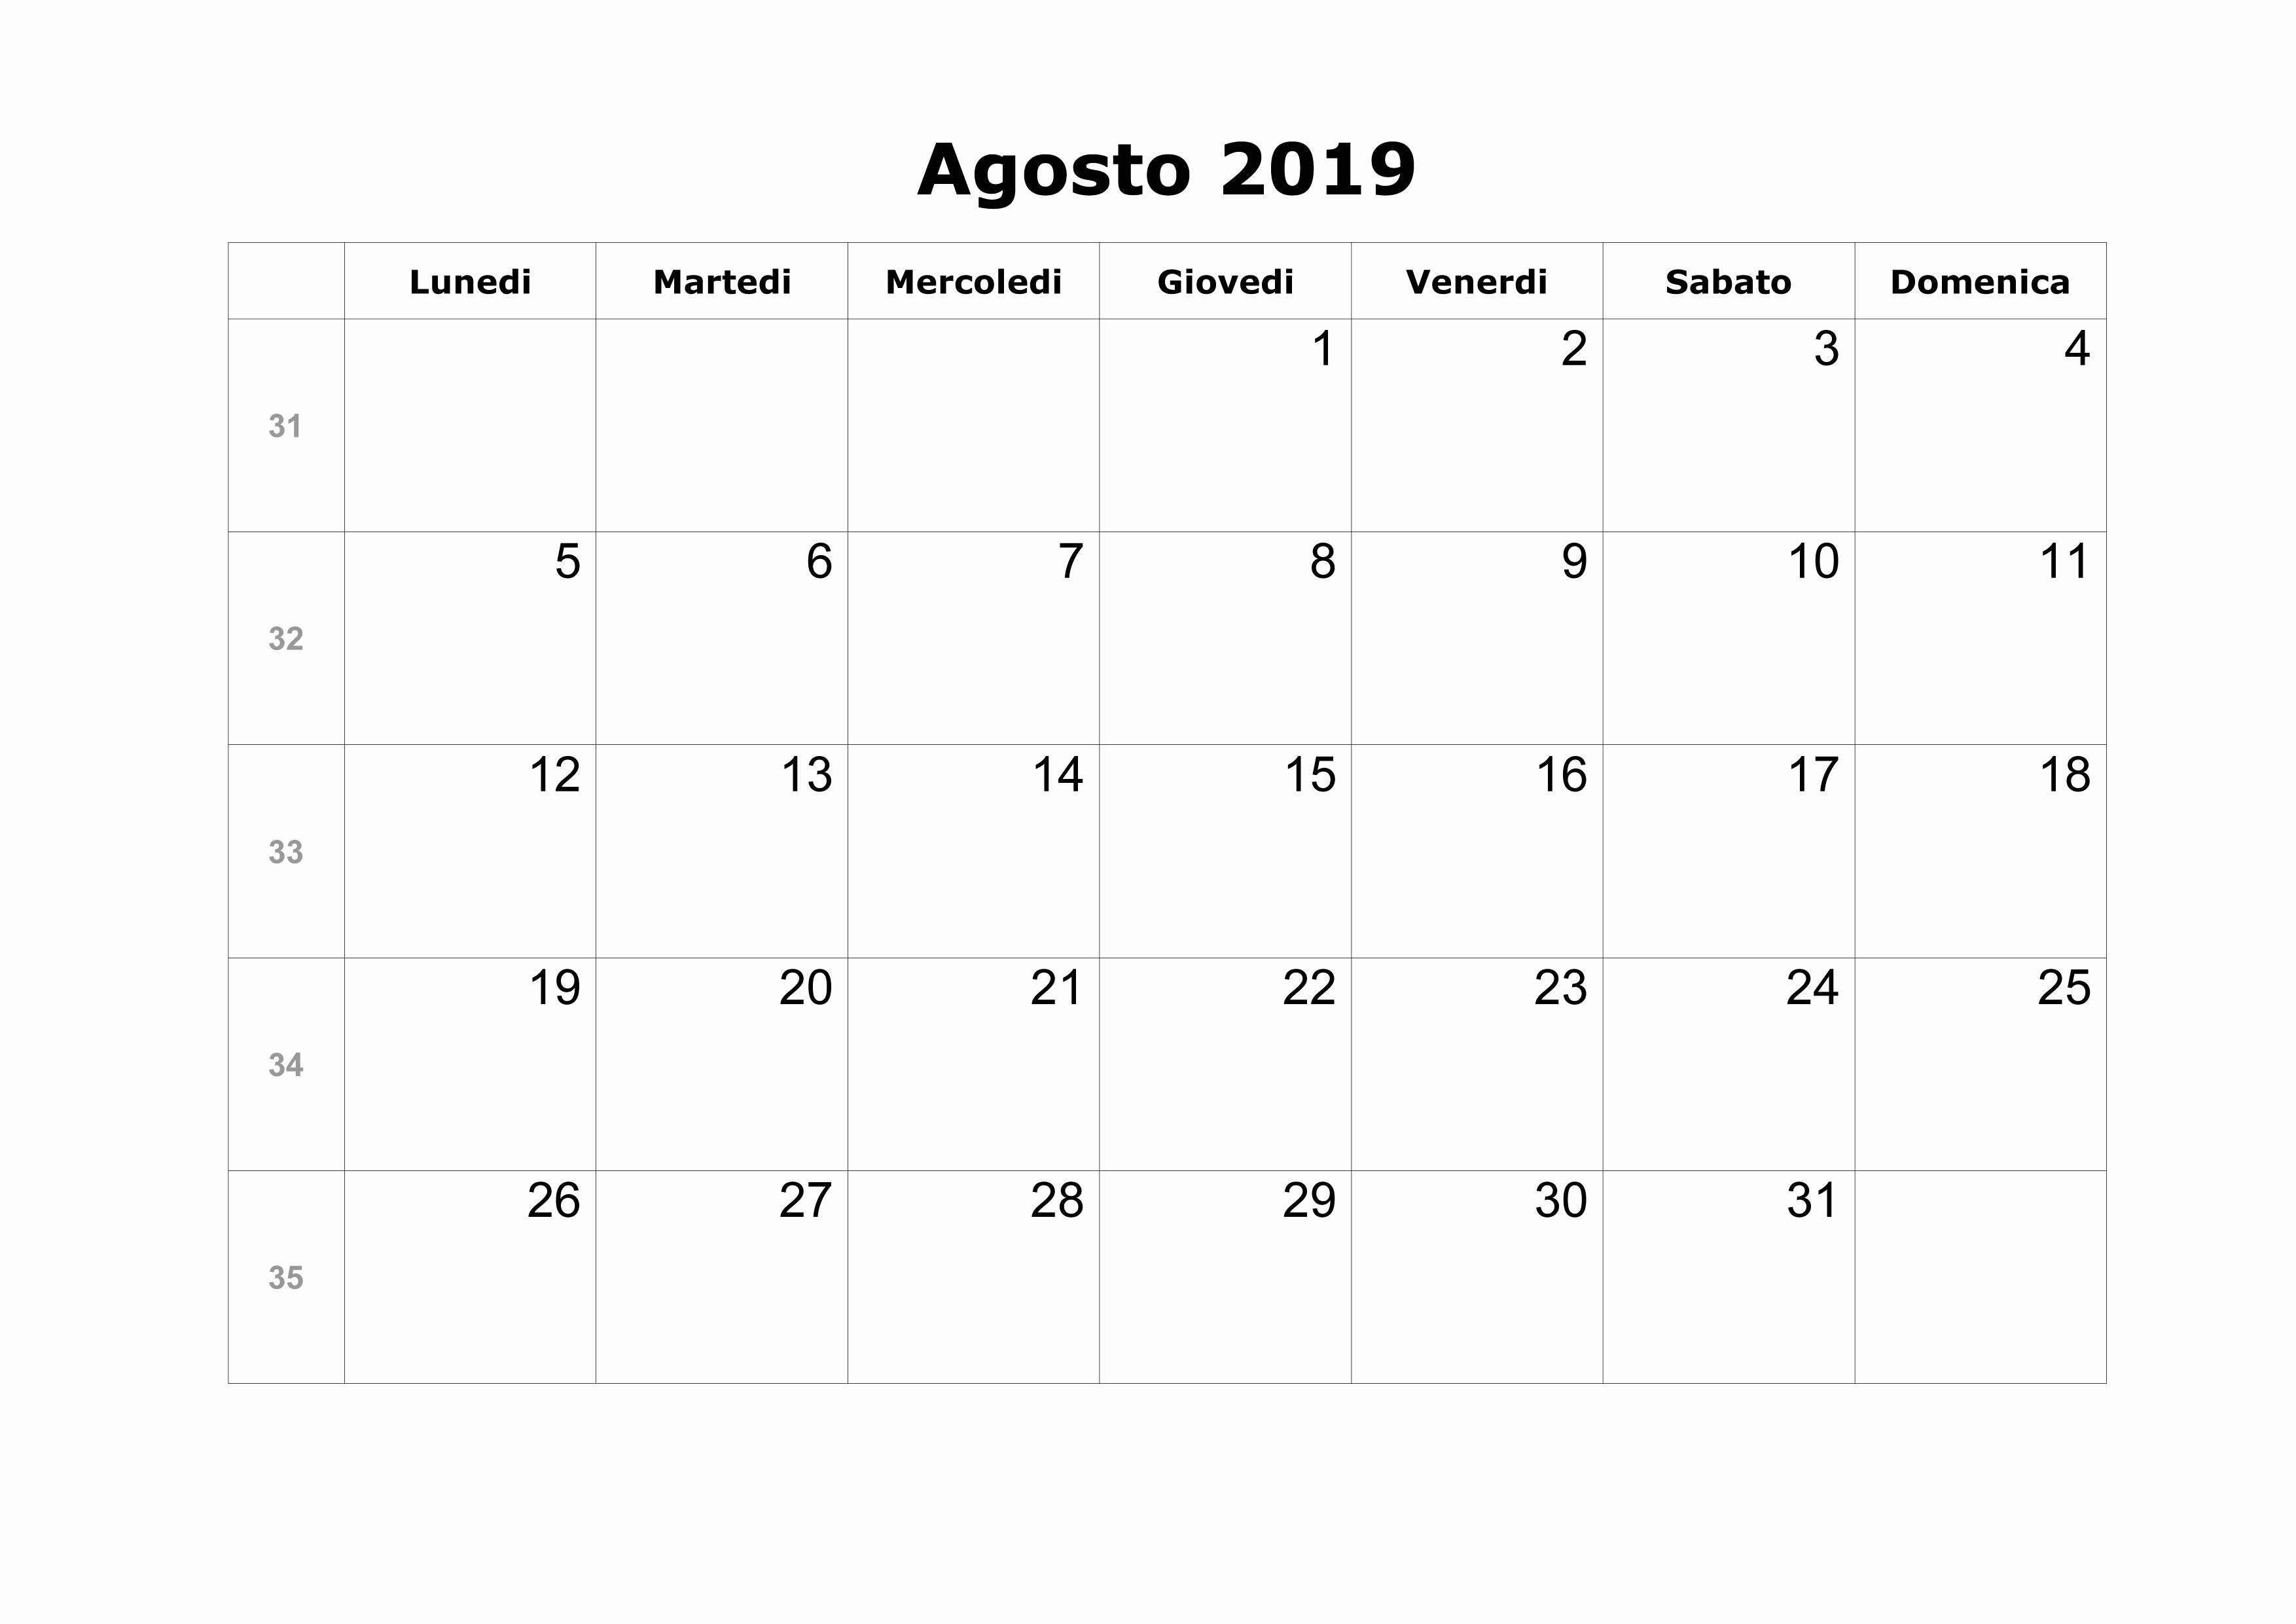 Calendario Para Imprimir 2019 Con Fotos Recientes Inspiraci³n 40 Ejemplo Agisto 2019 Of Calendario Para Imprimir 2019 Con Fotos Actual Printable 2019 Hd Wall Calendar